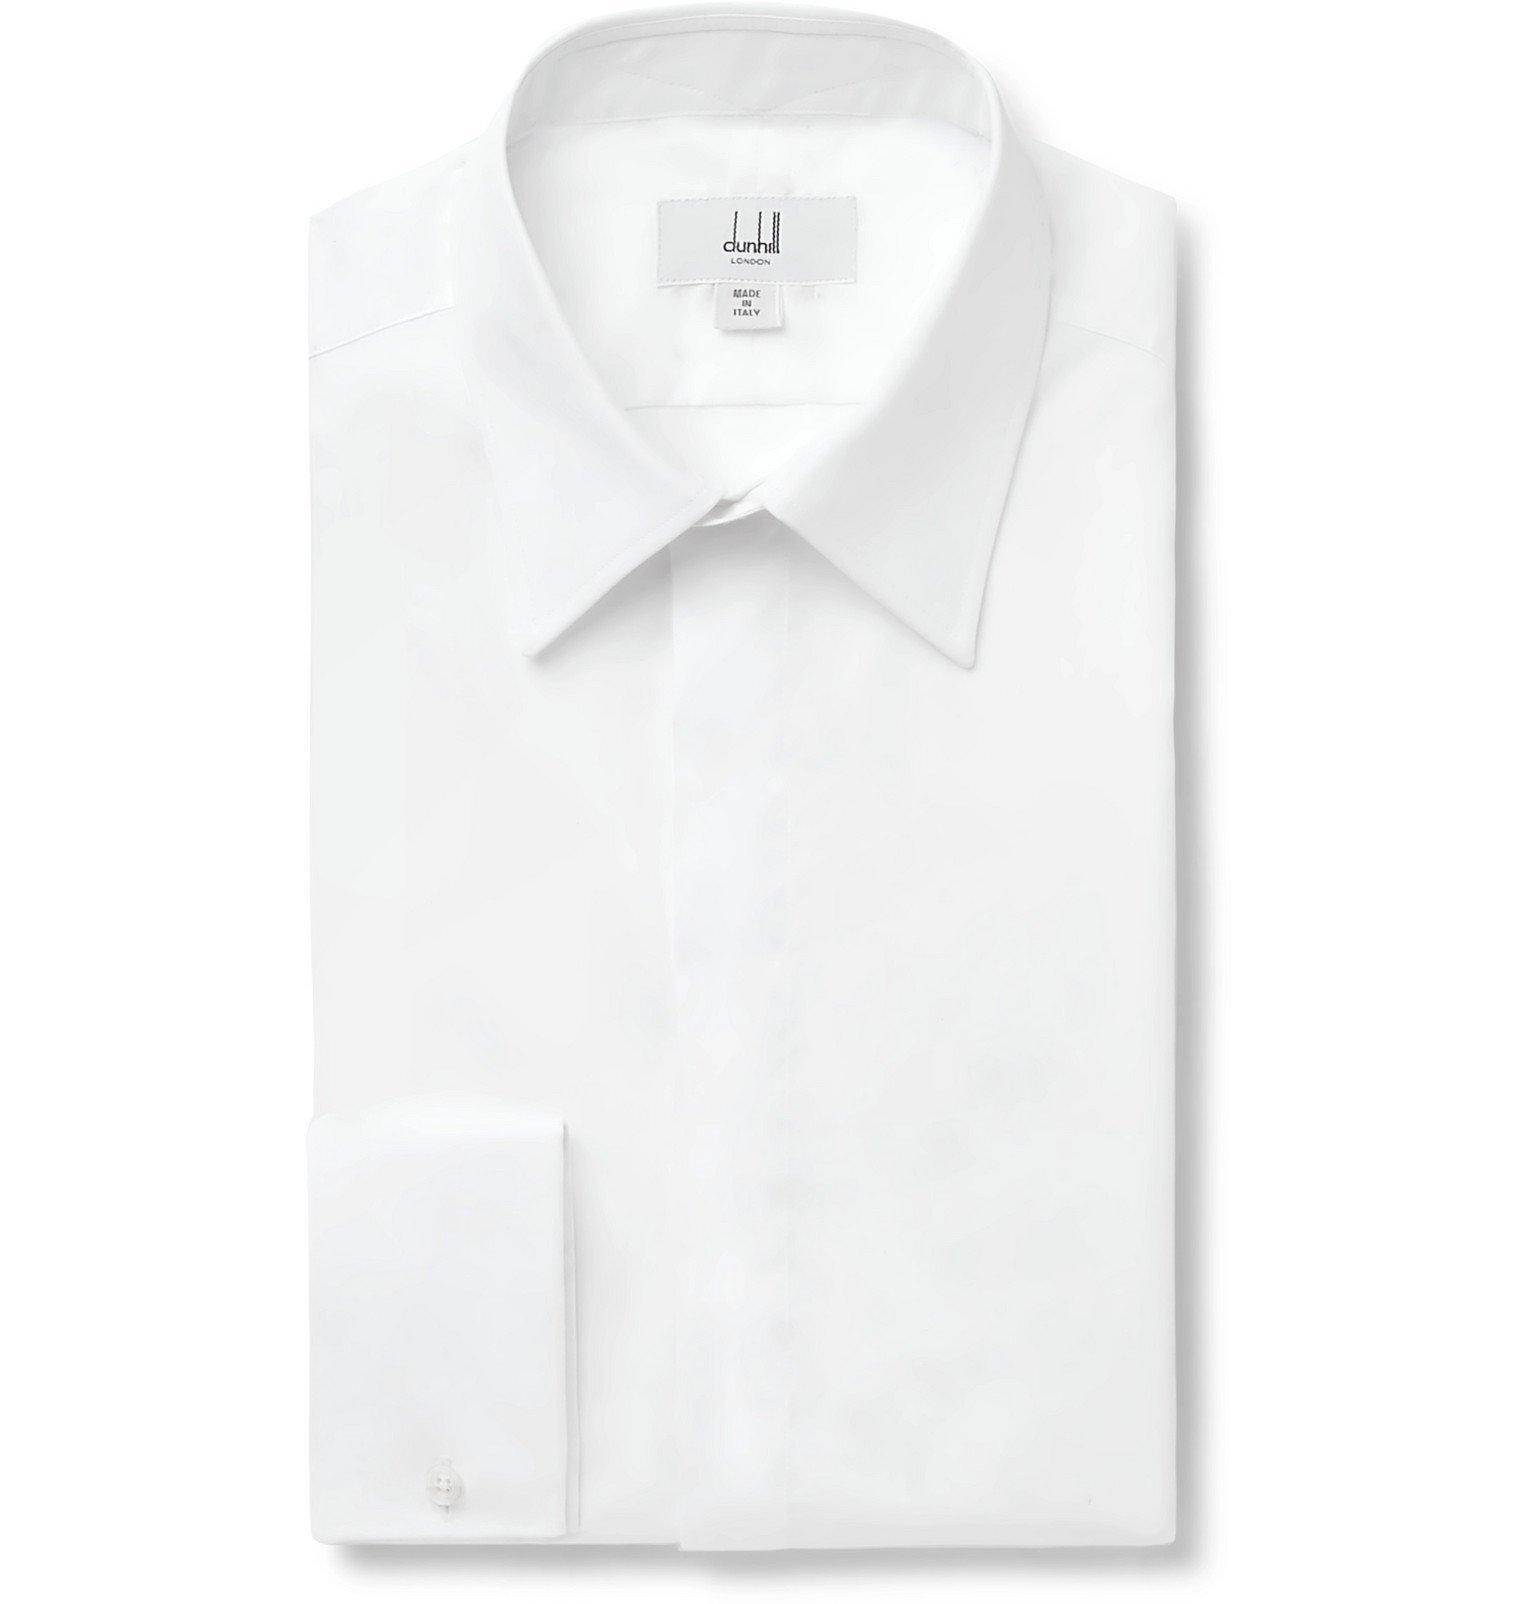 Dunhill - White Double-Cuff Cotton Shirt - White